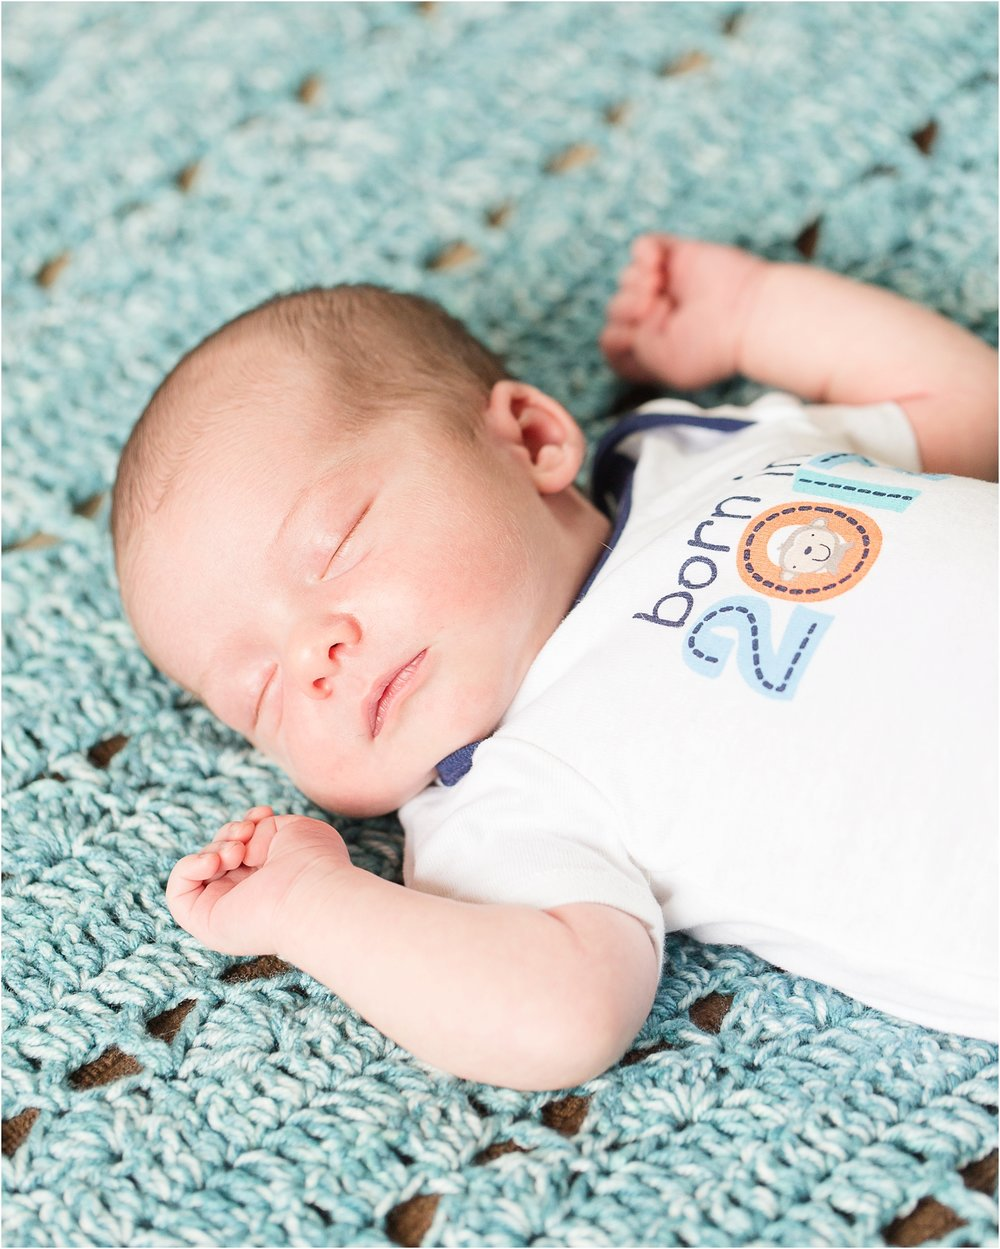 Carroll-county-newborn-photographer_0054.jpg